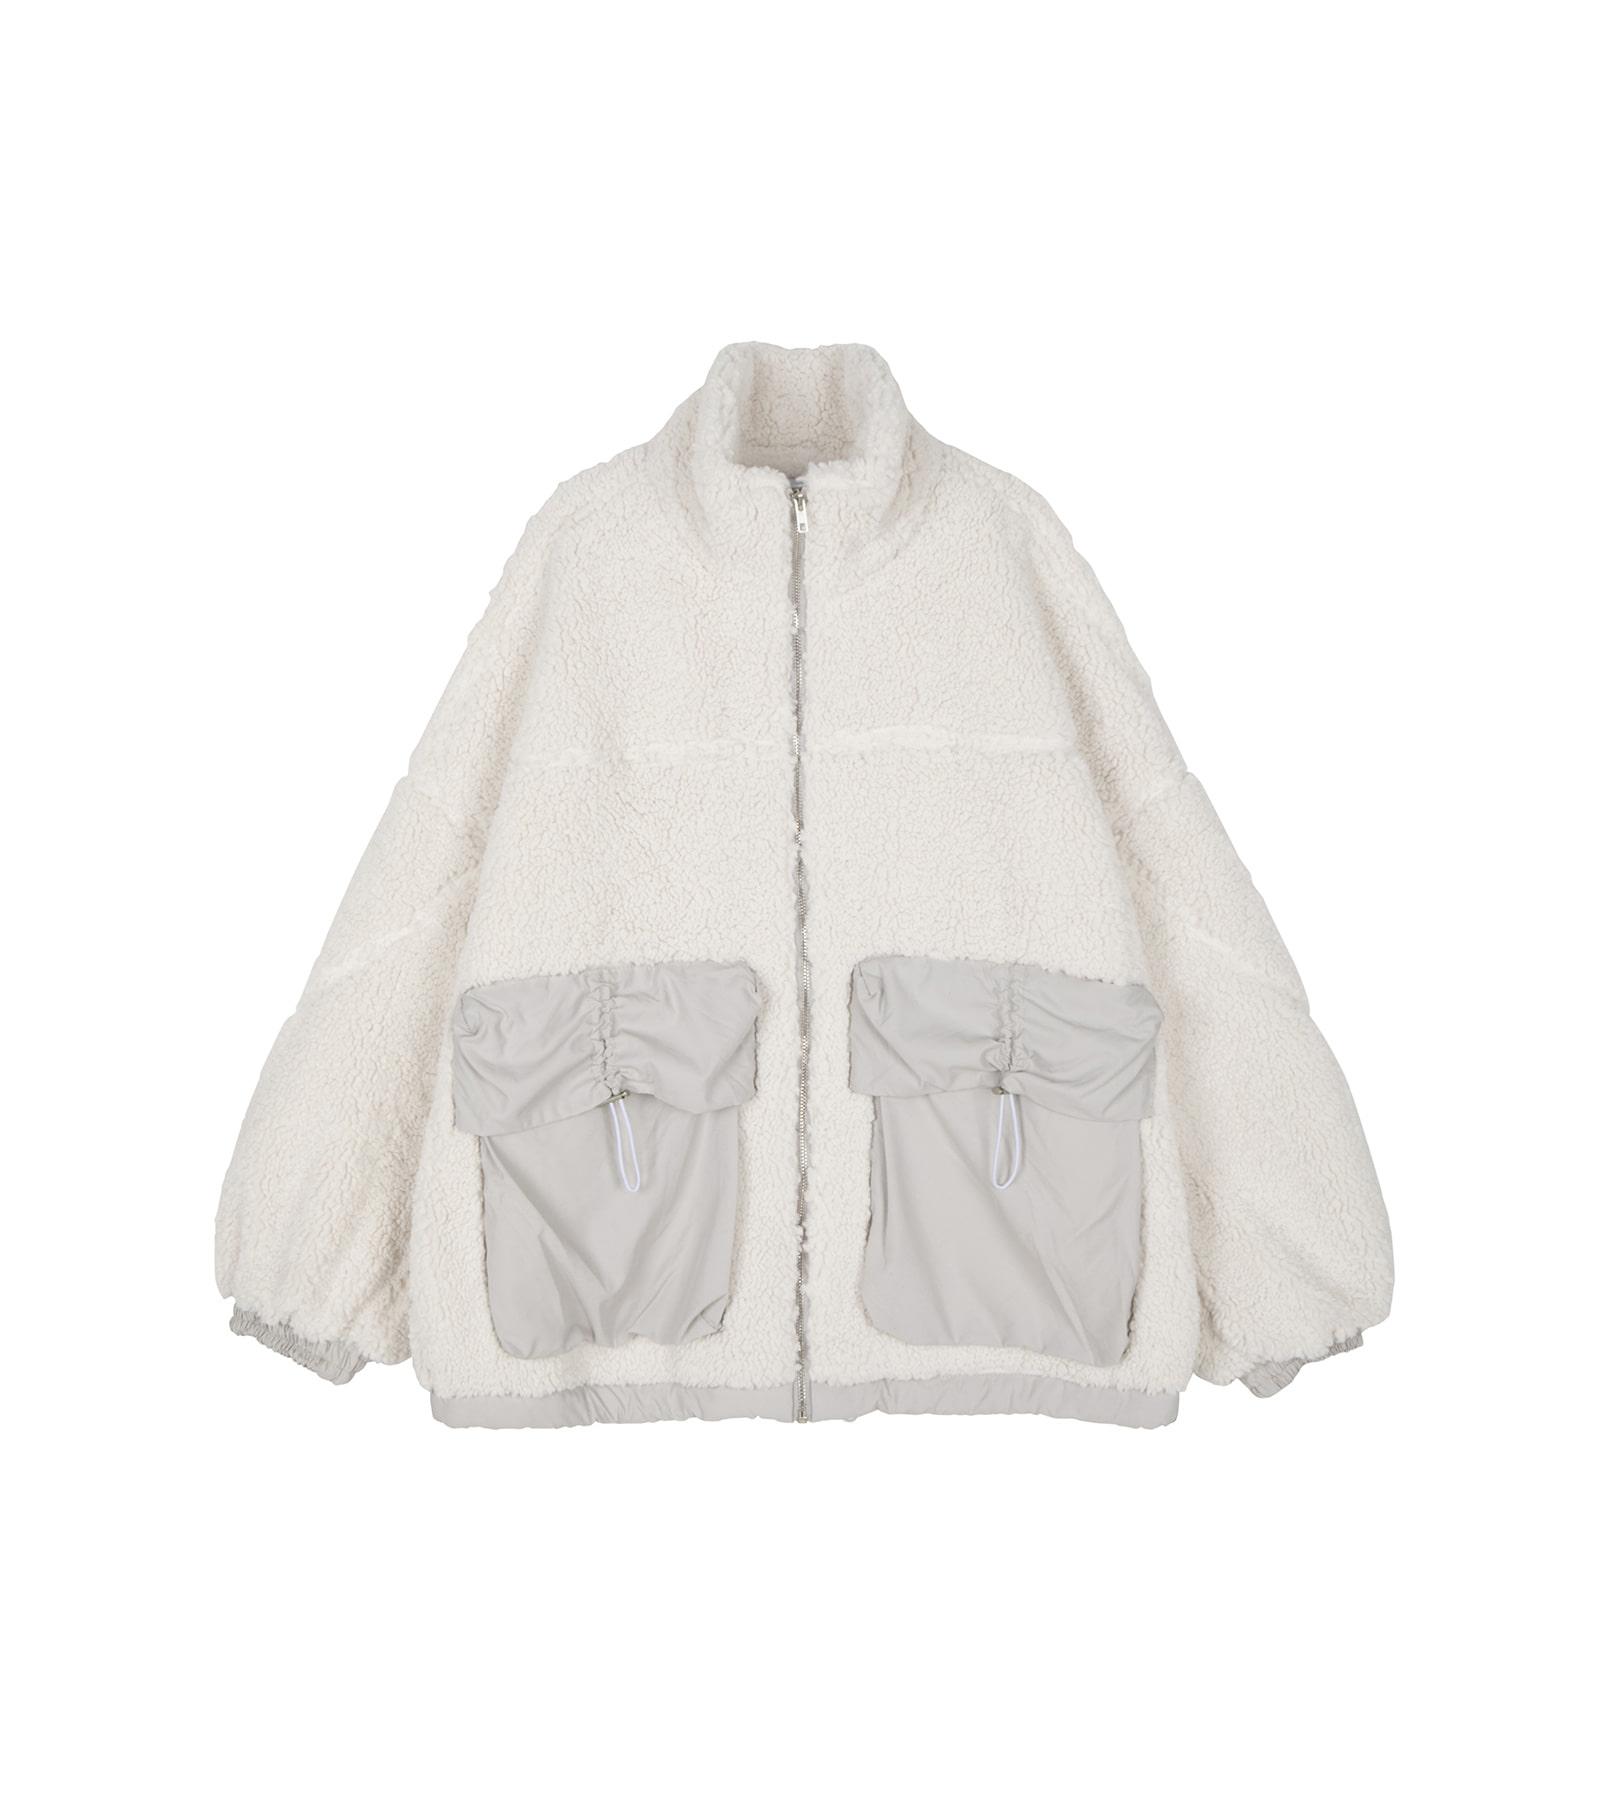 Unisex Big Pocket Color Shearing Jacket